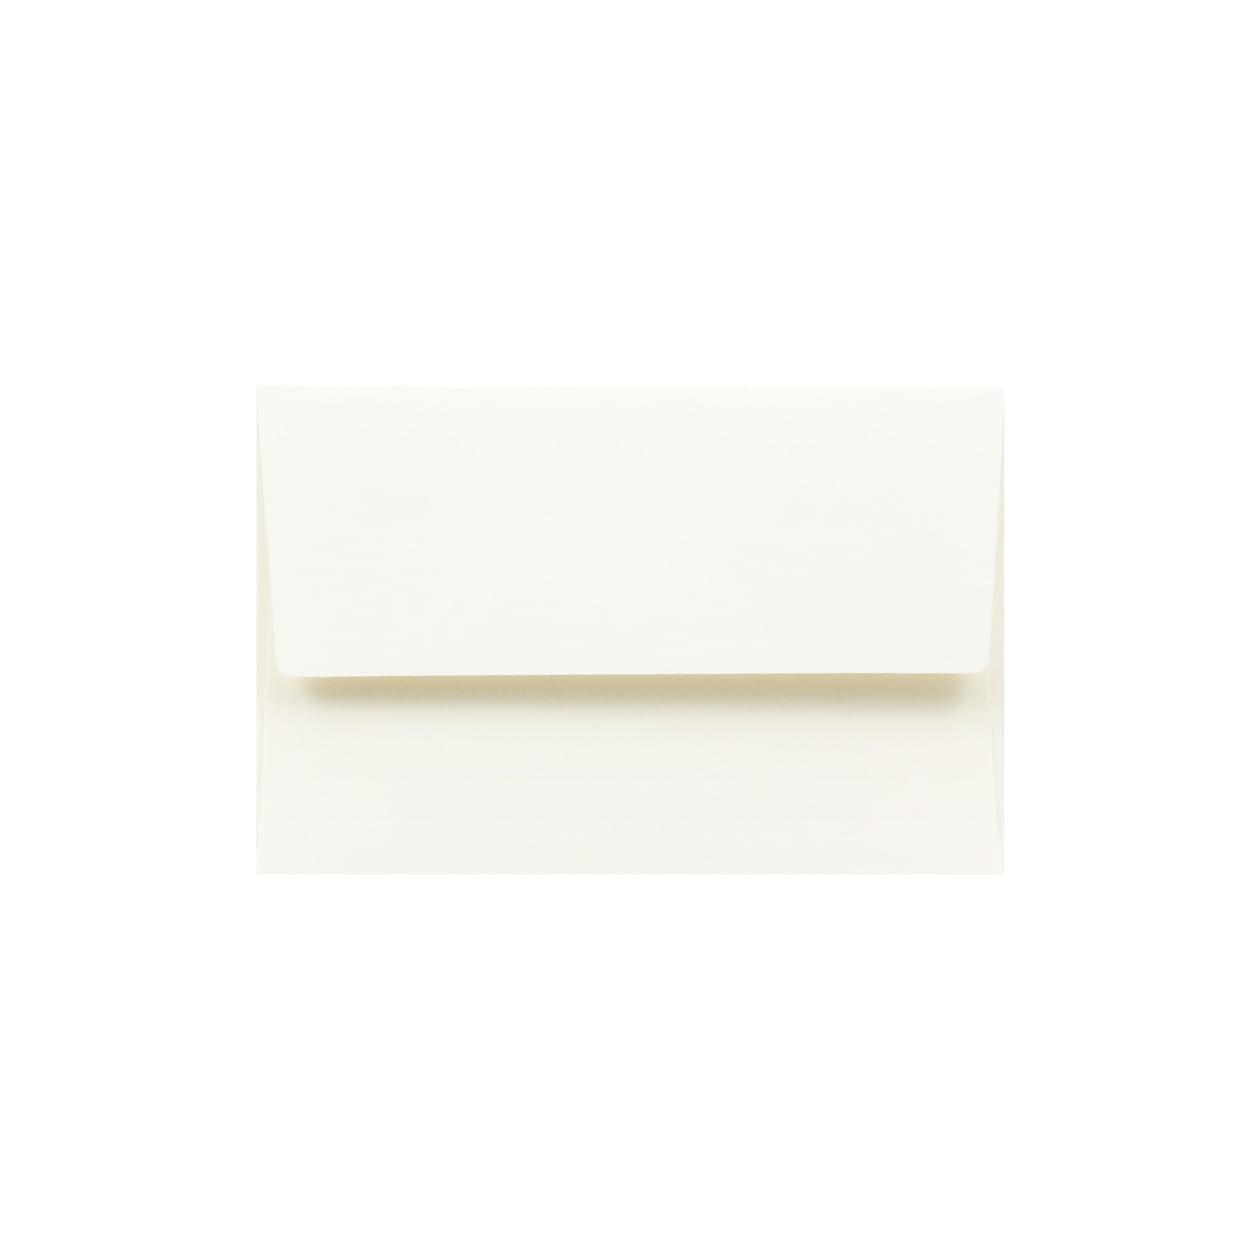 NEカマス封筒 HAGURUMA Basic ソフトクリーム 100g